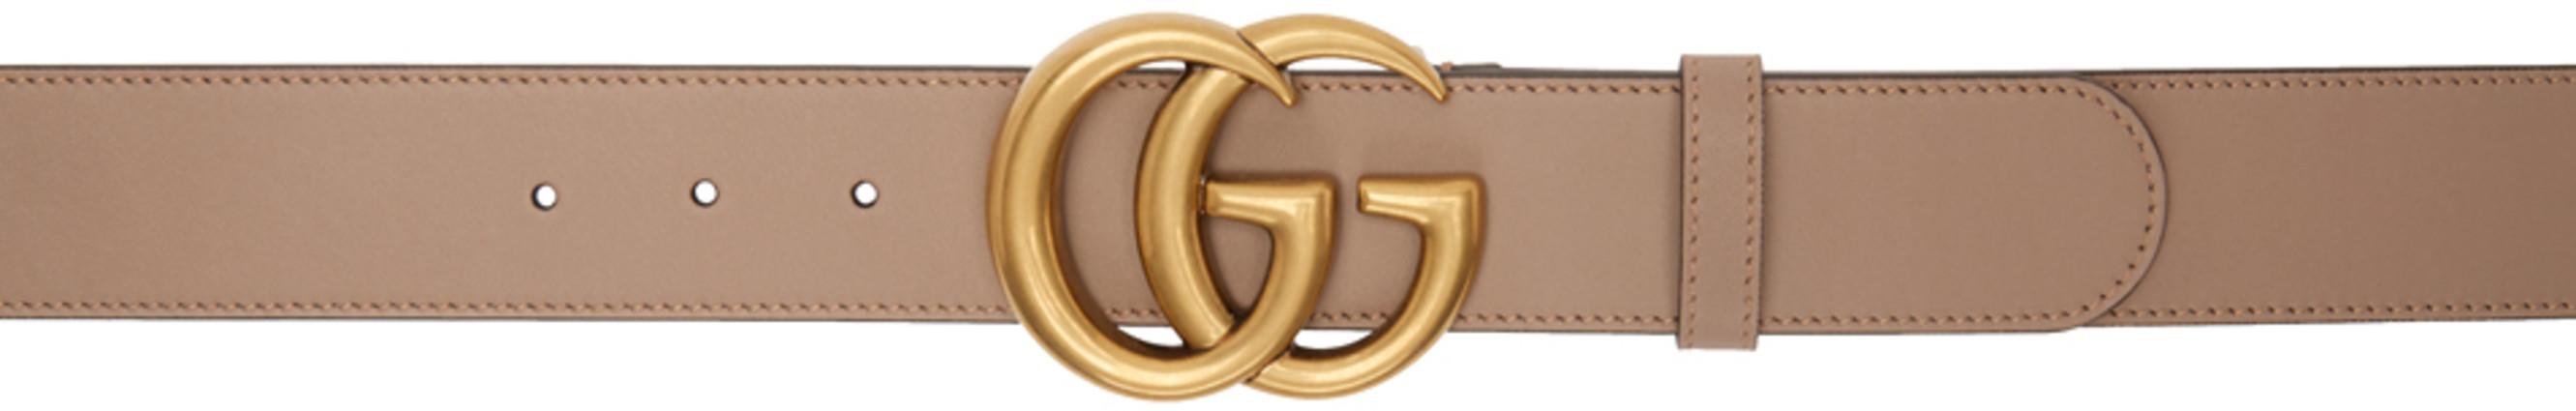 86ba993ee0a Gucci belts   suspenders for Women